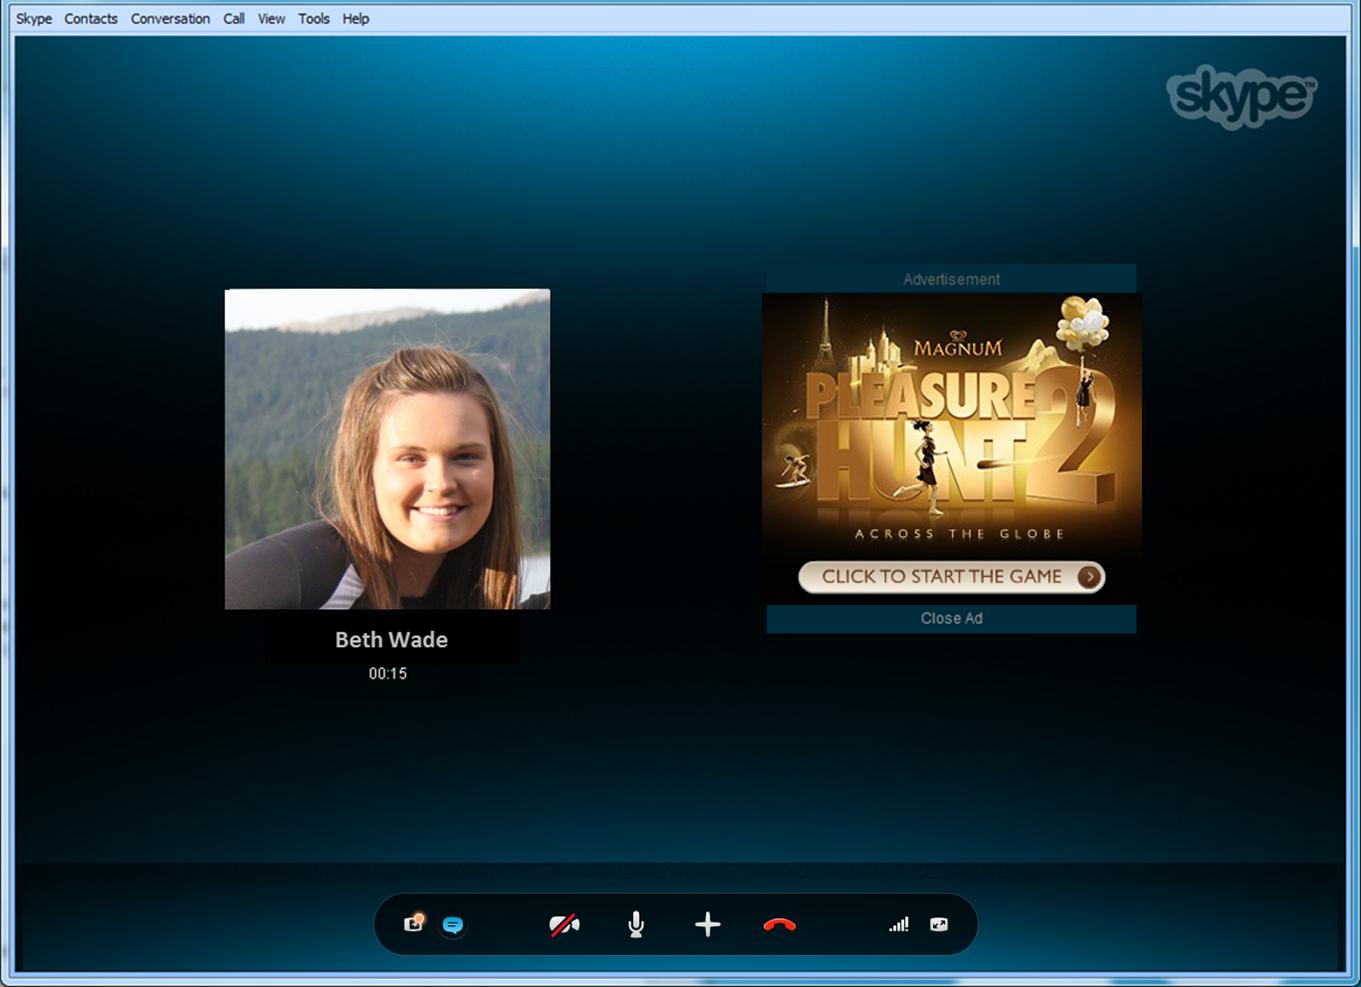 Skype's new Conversation Ad